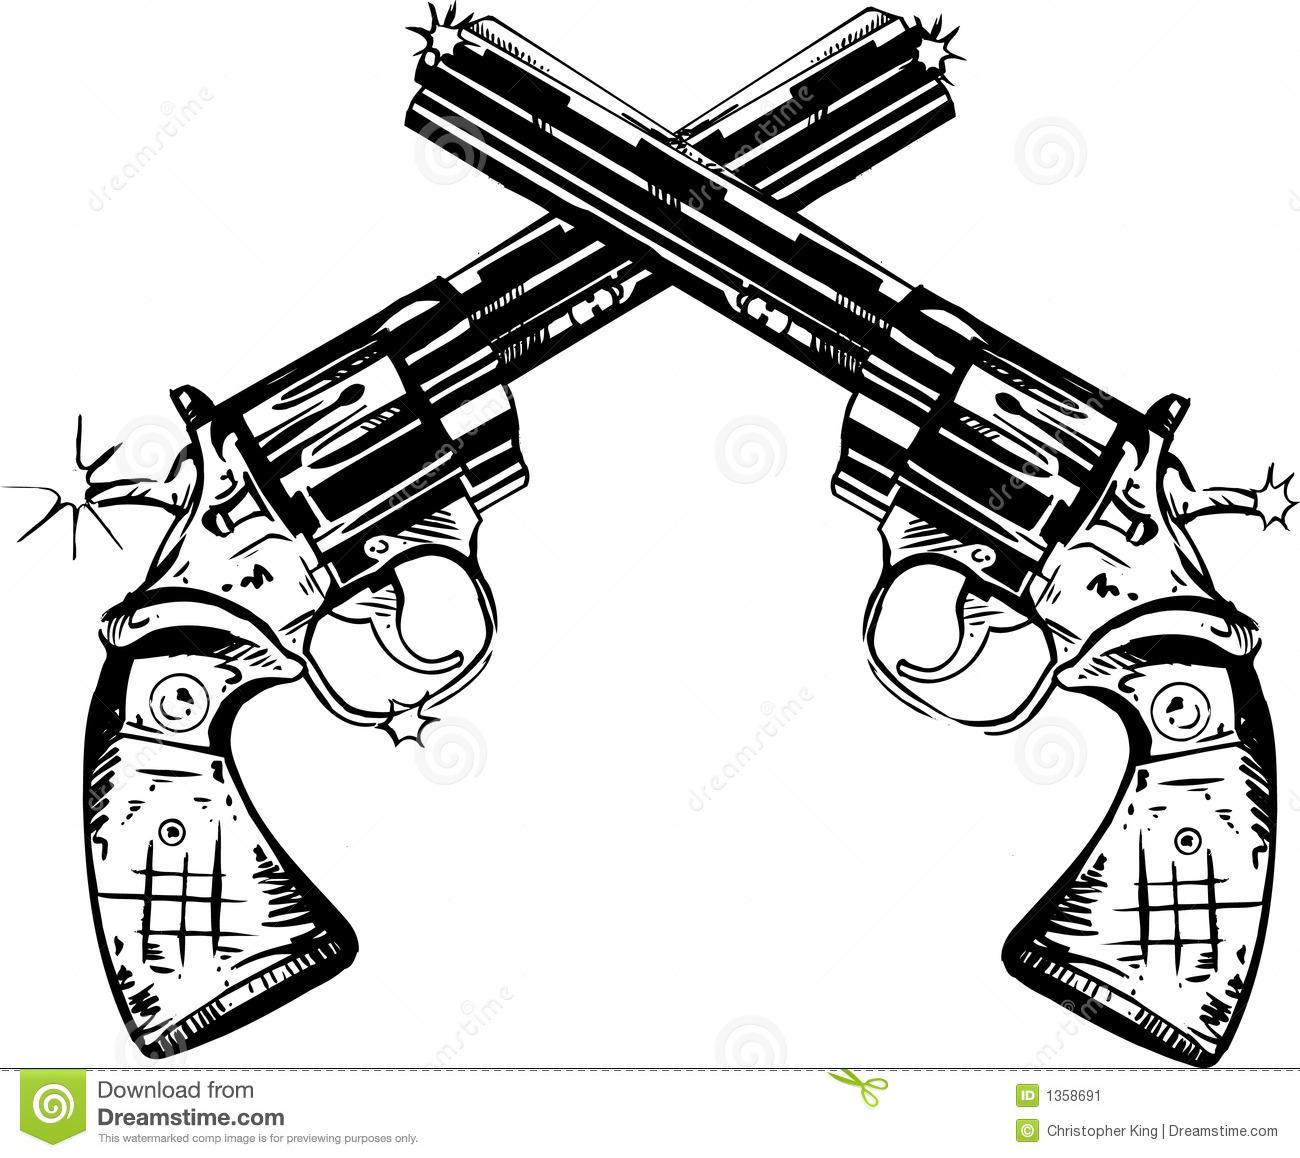 Clip Art Guns Clipart crossed guns clipart kid pen and ink illustration of two magnum pistols mr no pr 5 4532 36